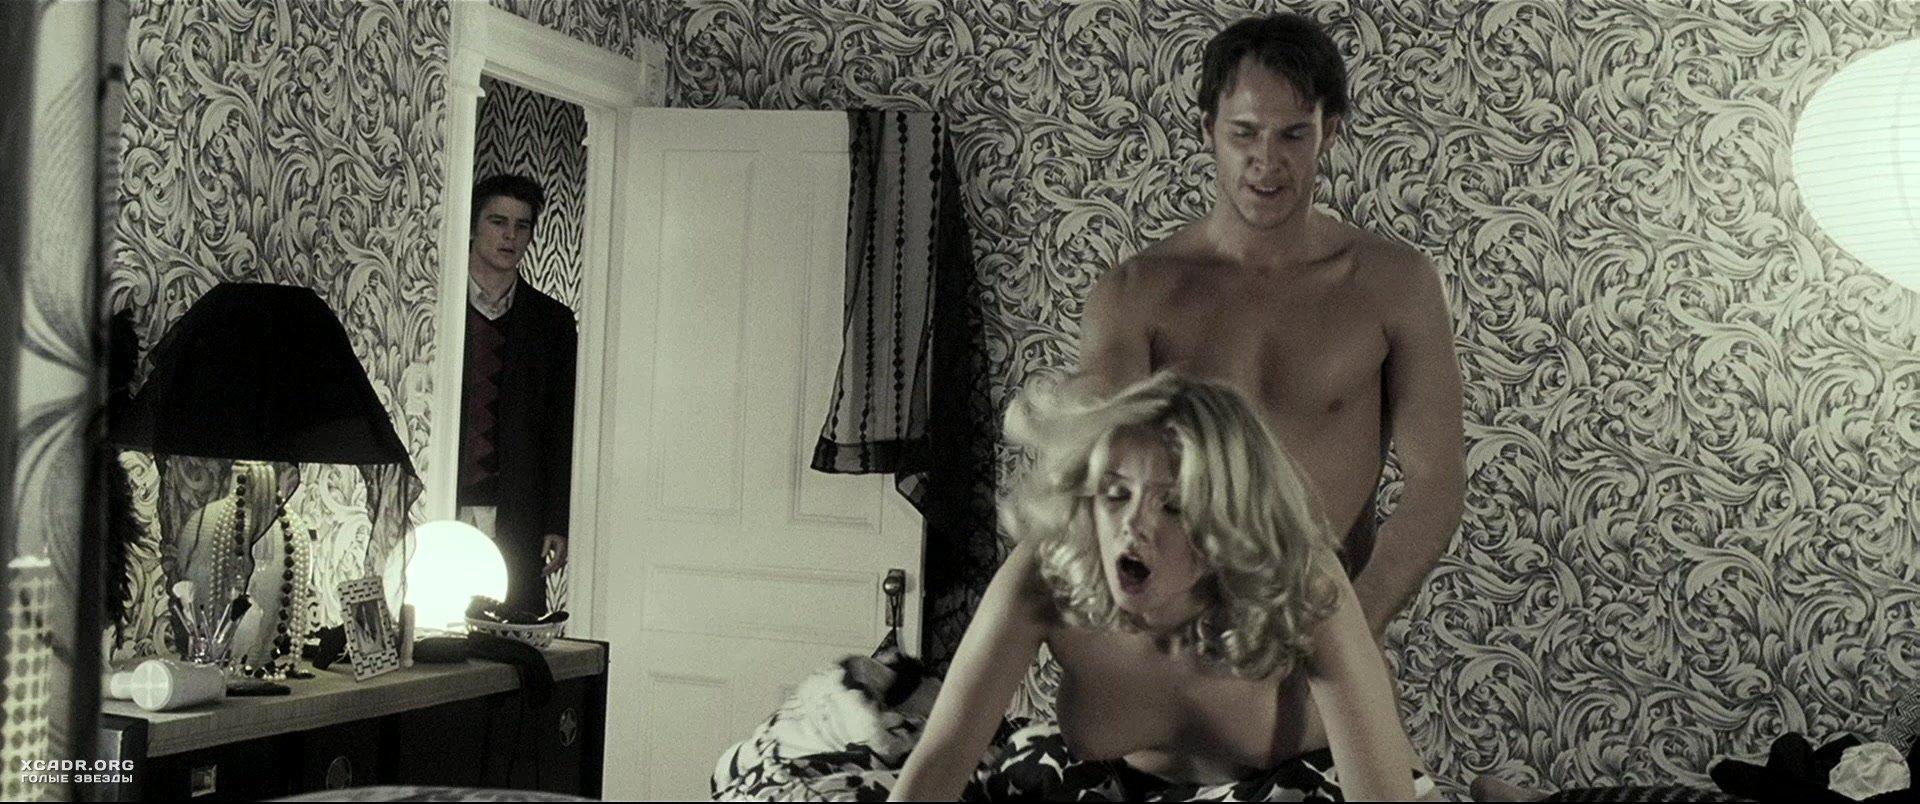 Порно сцены измены мужу